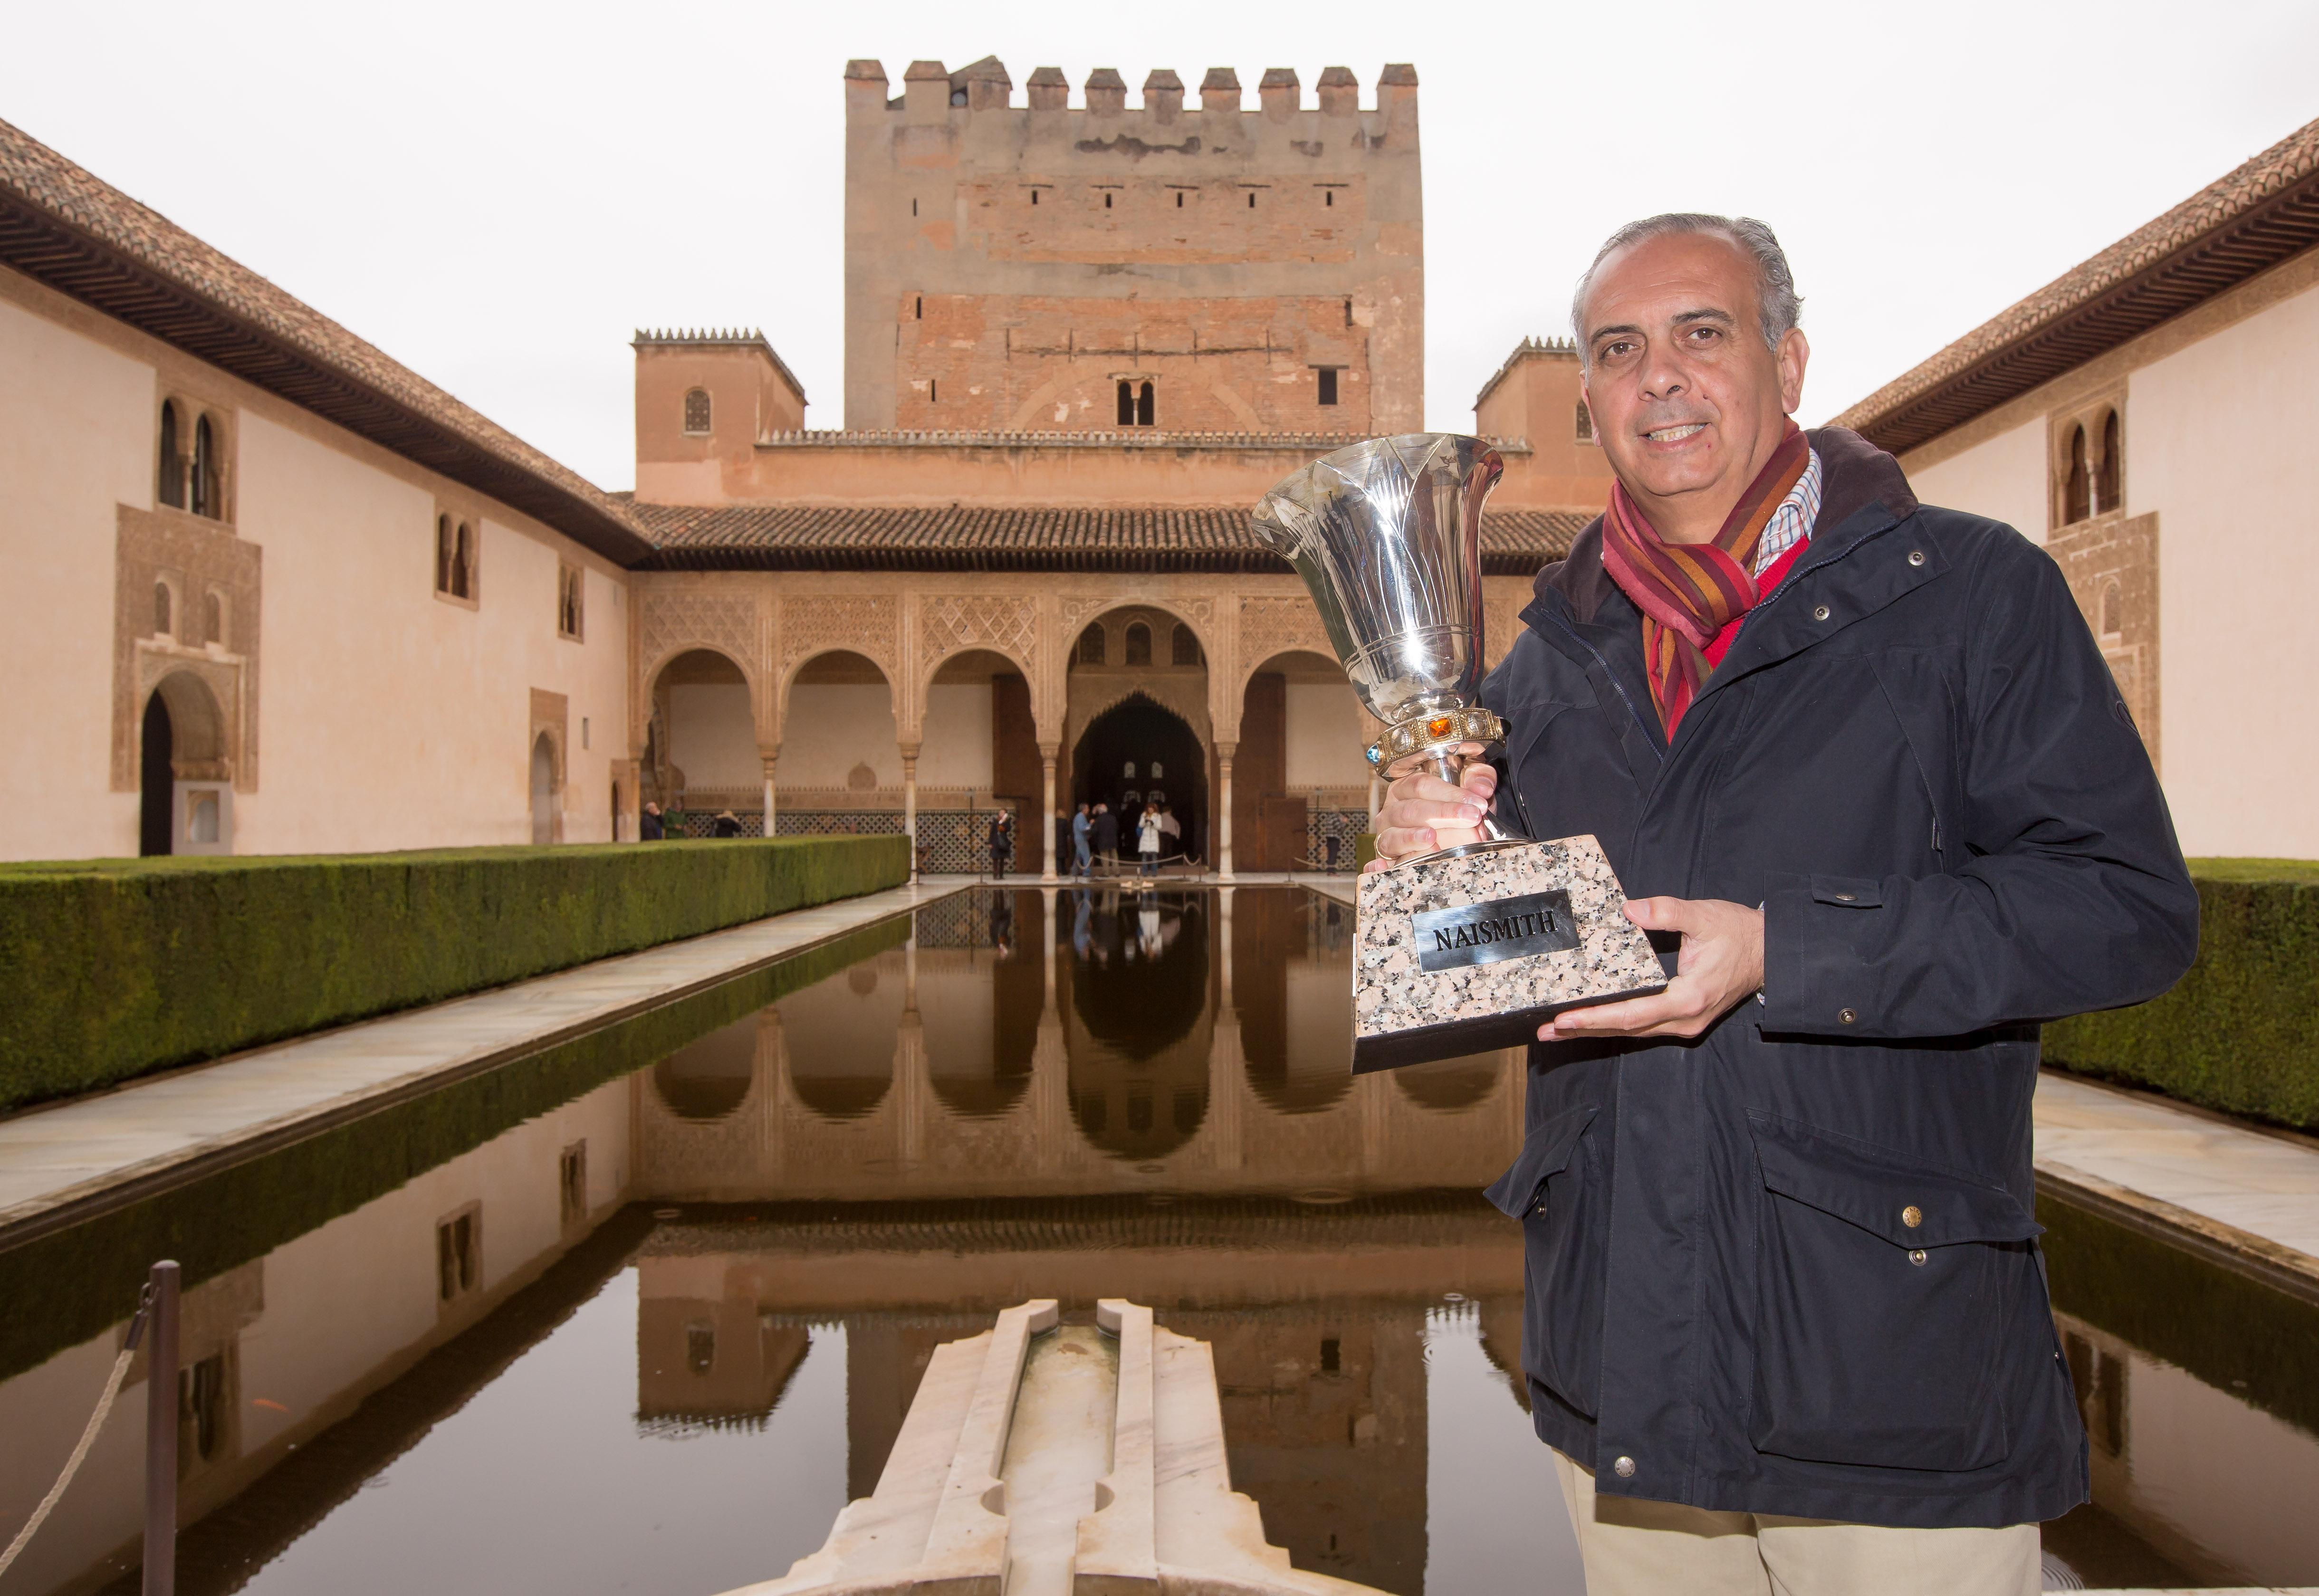 Alhambra, con la Copa del Mundo de Baloncesto